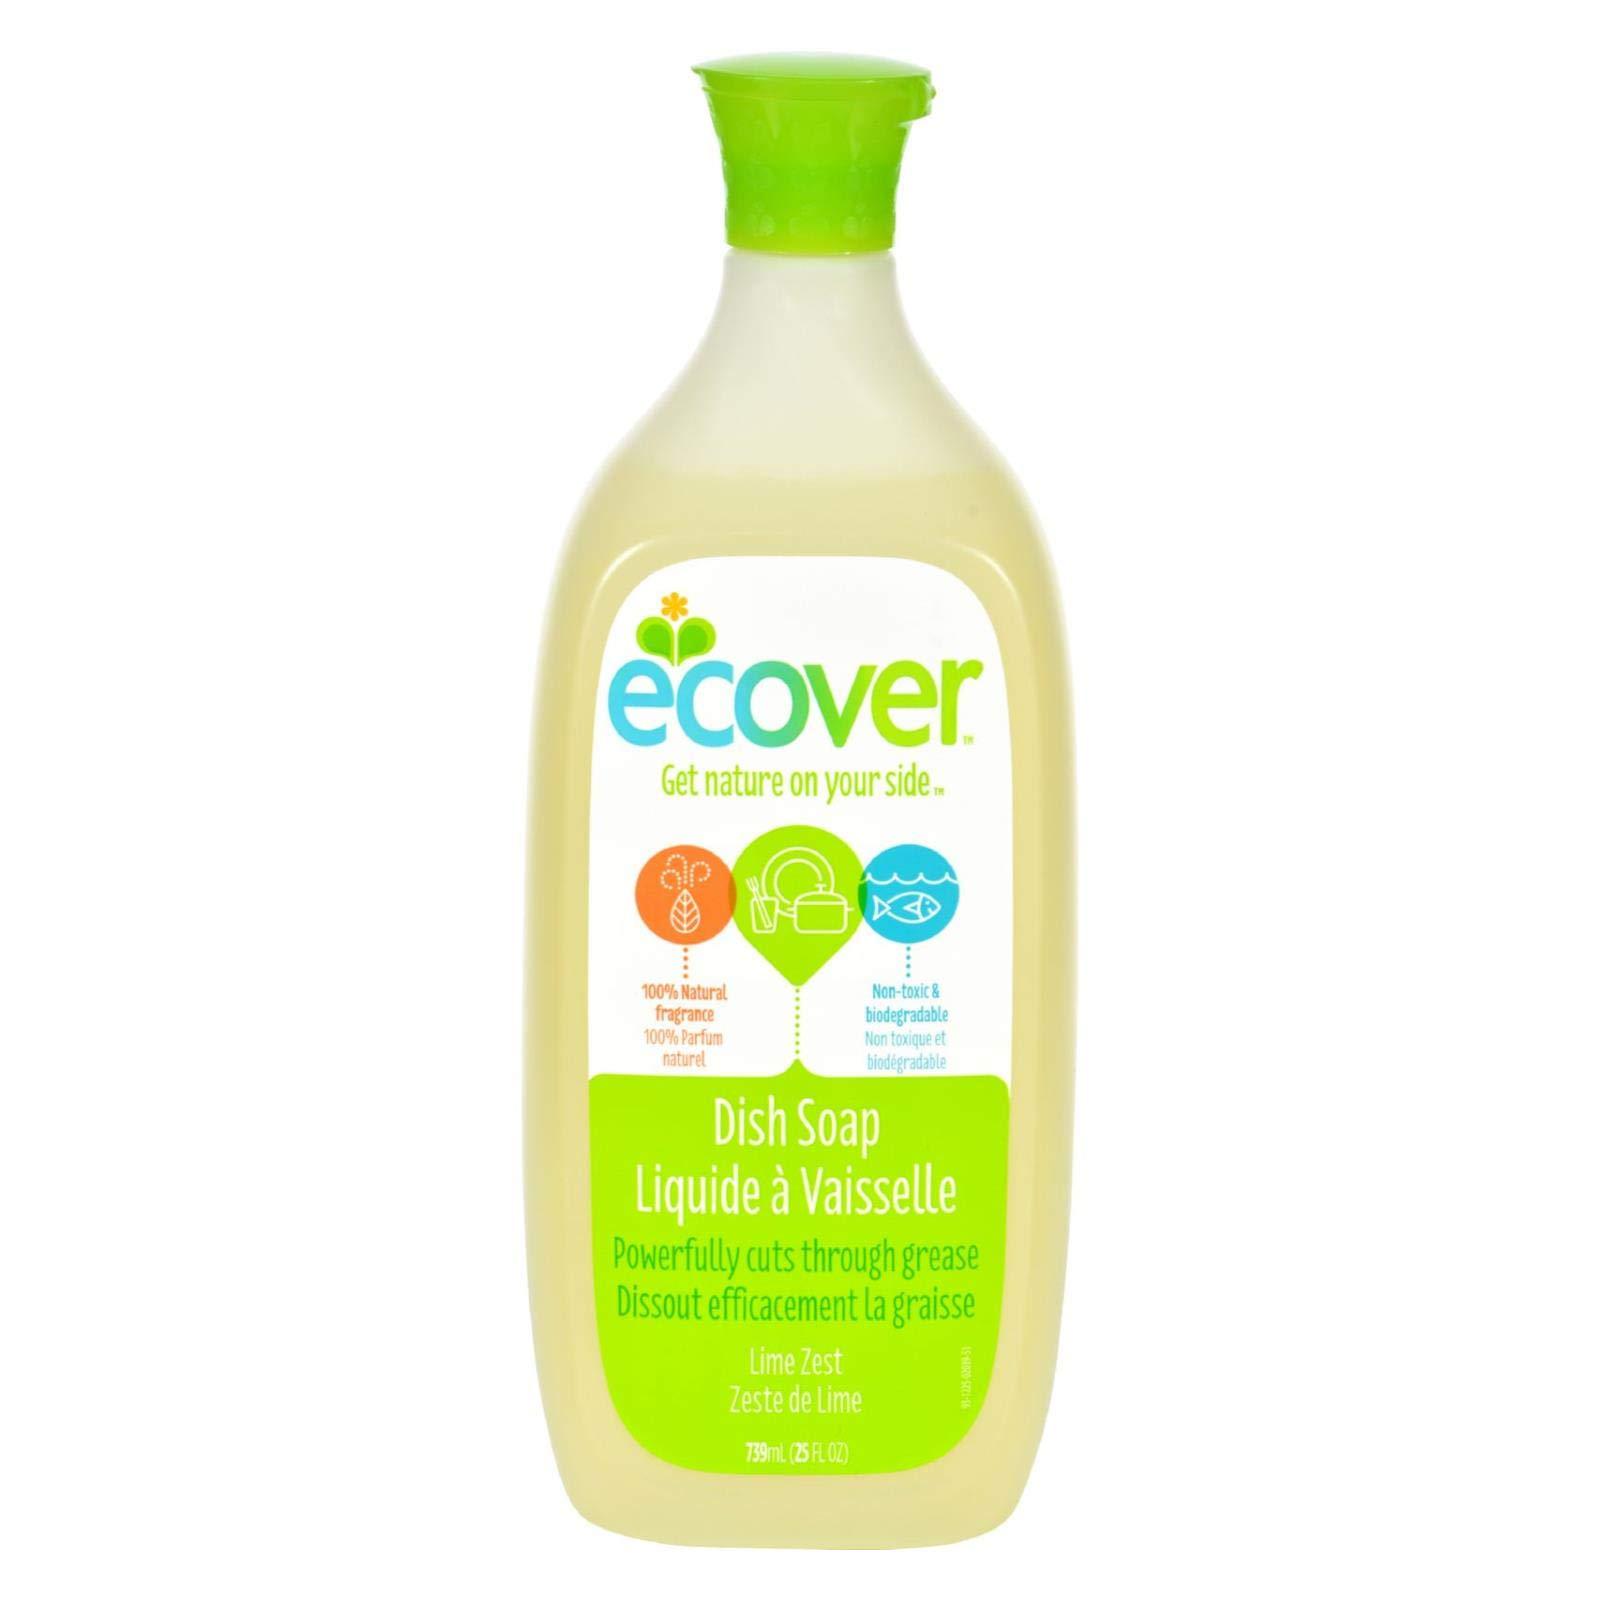 Ecover Liquid Dish Soap - Lime Zest - 25 oz - Case of 6